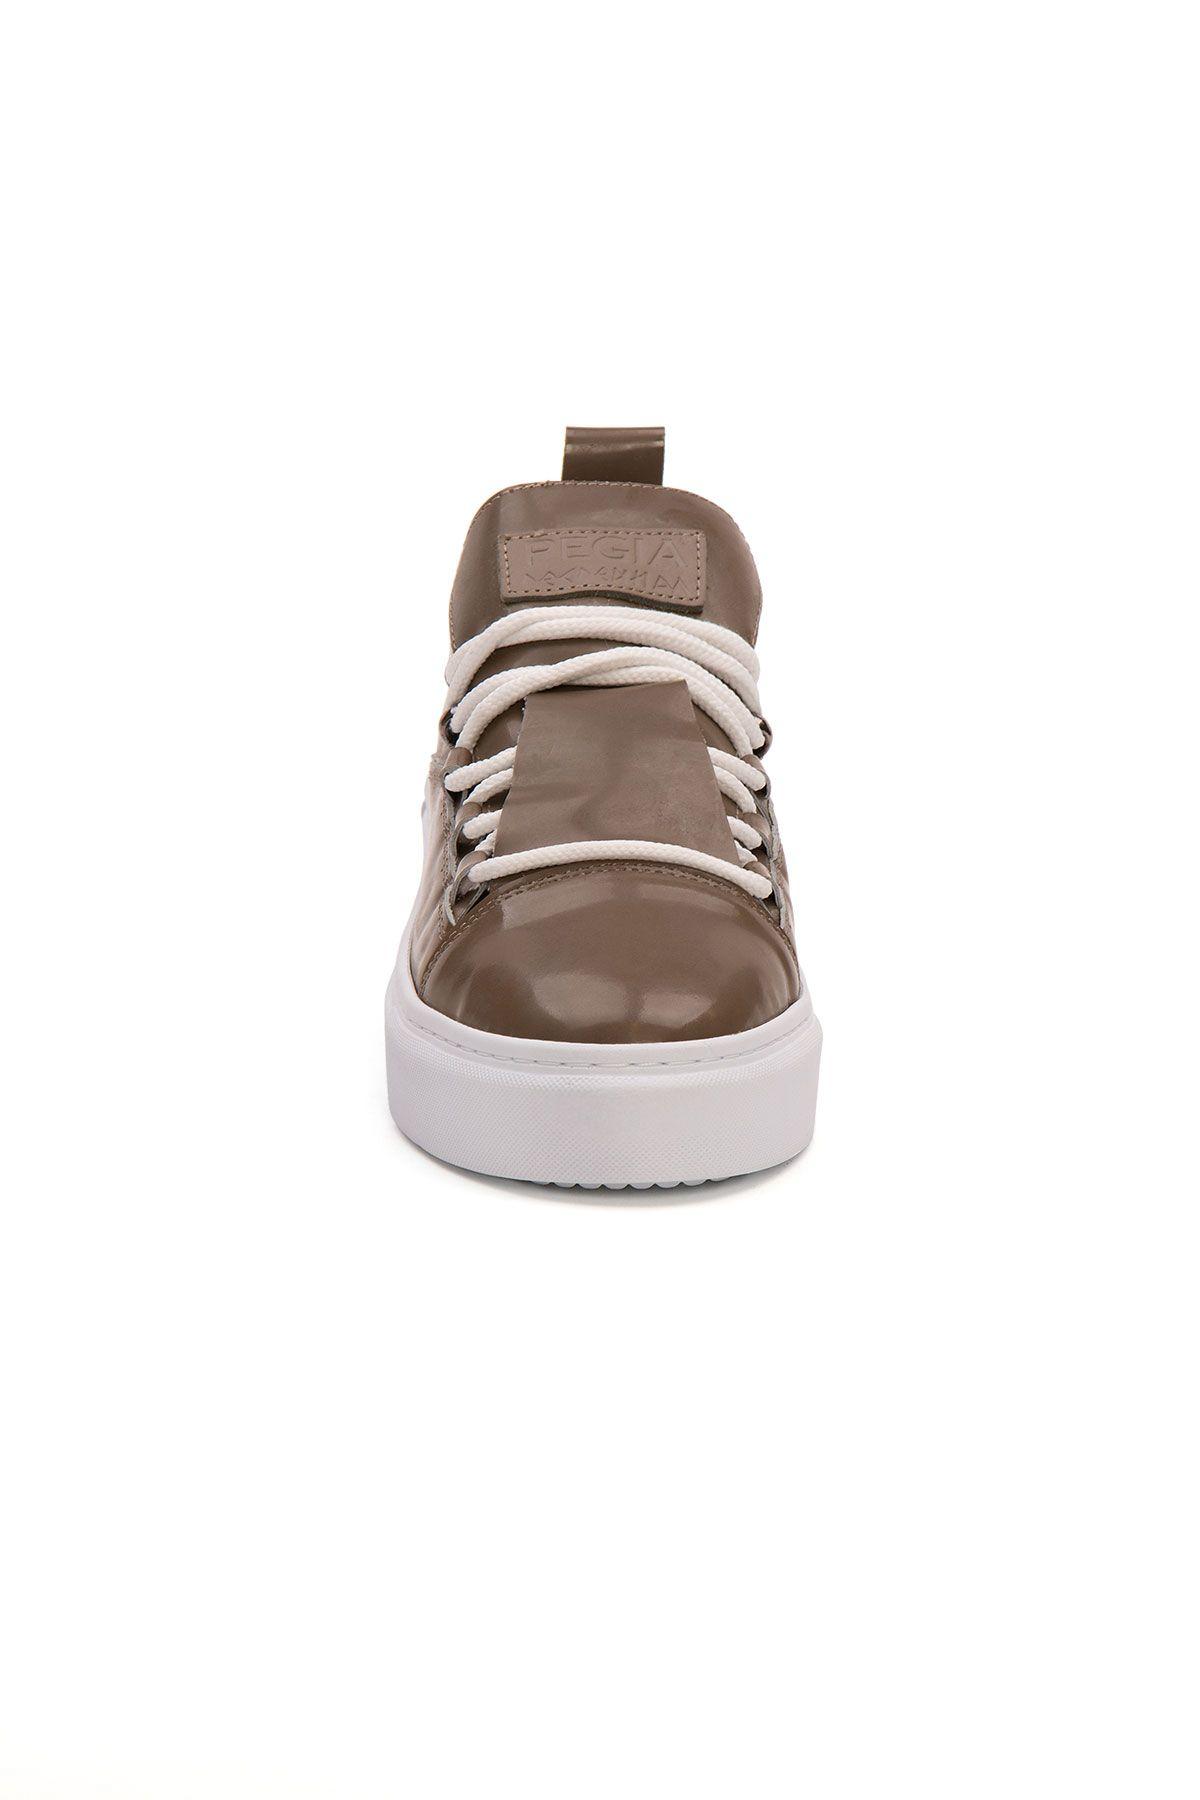 Pegia Genuine Leather Women's Sneaker LA1717 Khaki